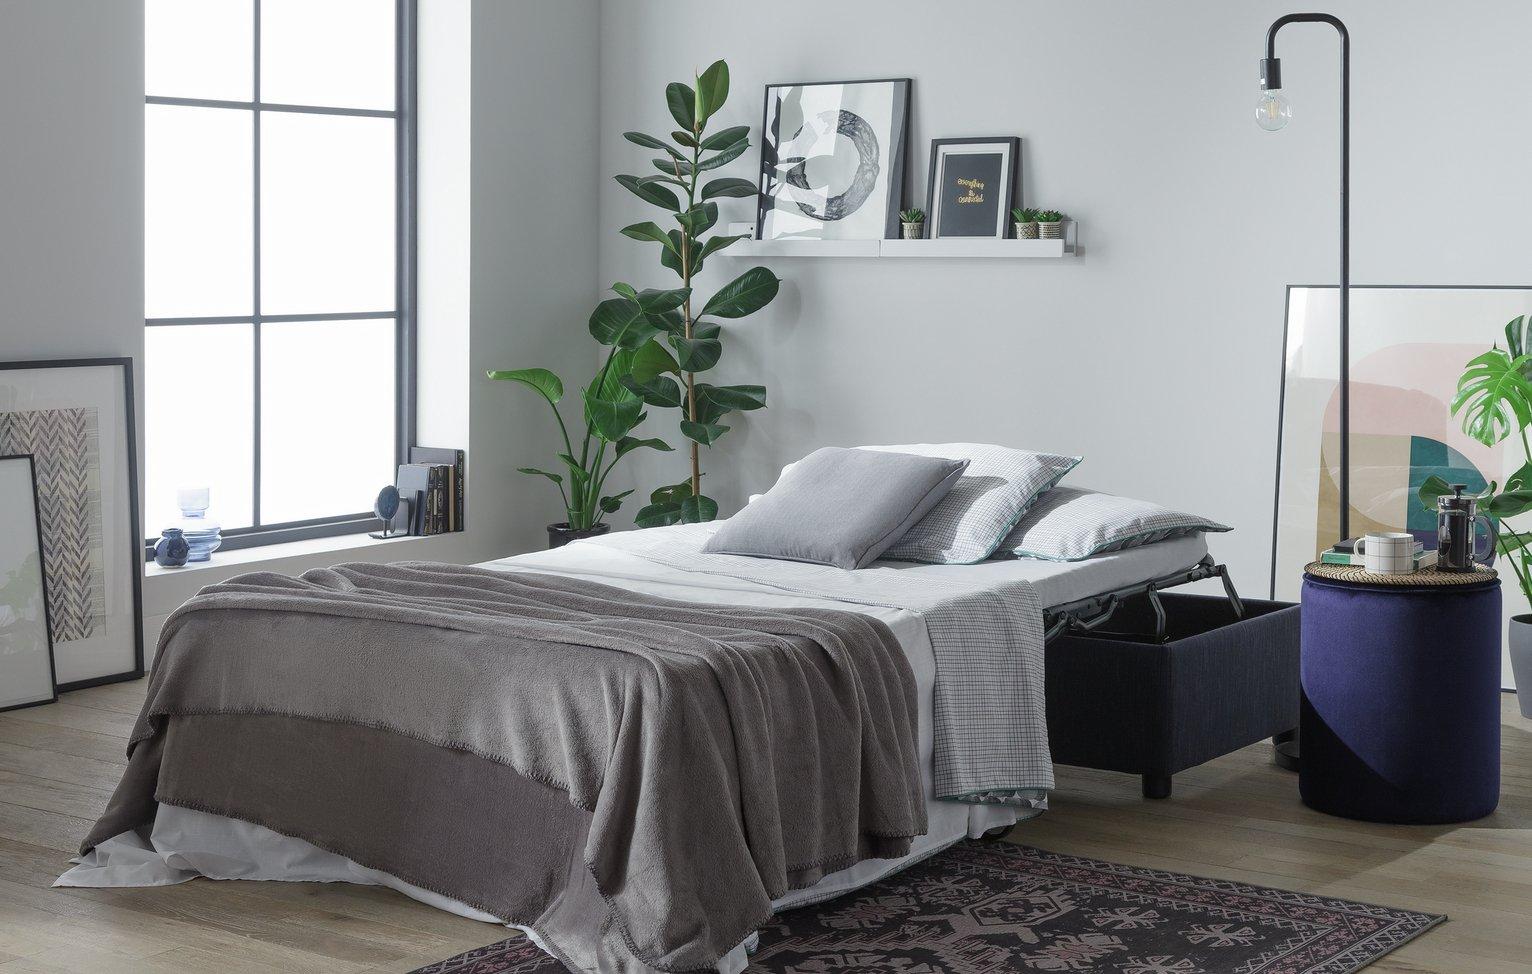 Argos Home Nate Fabric Ottoman Sofa Bed - Navy + 2 year guarantee £161.95 delivered @ Argos